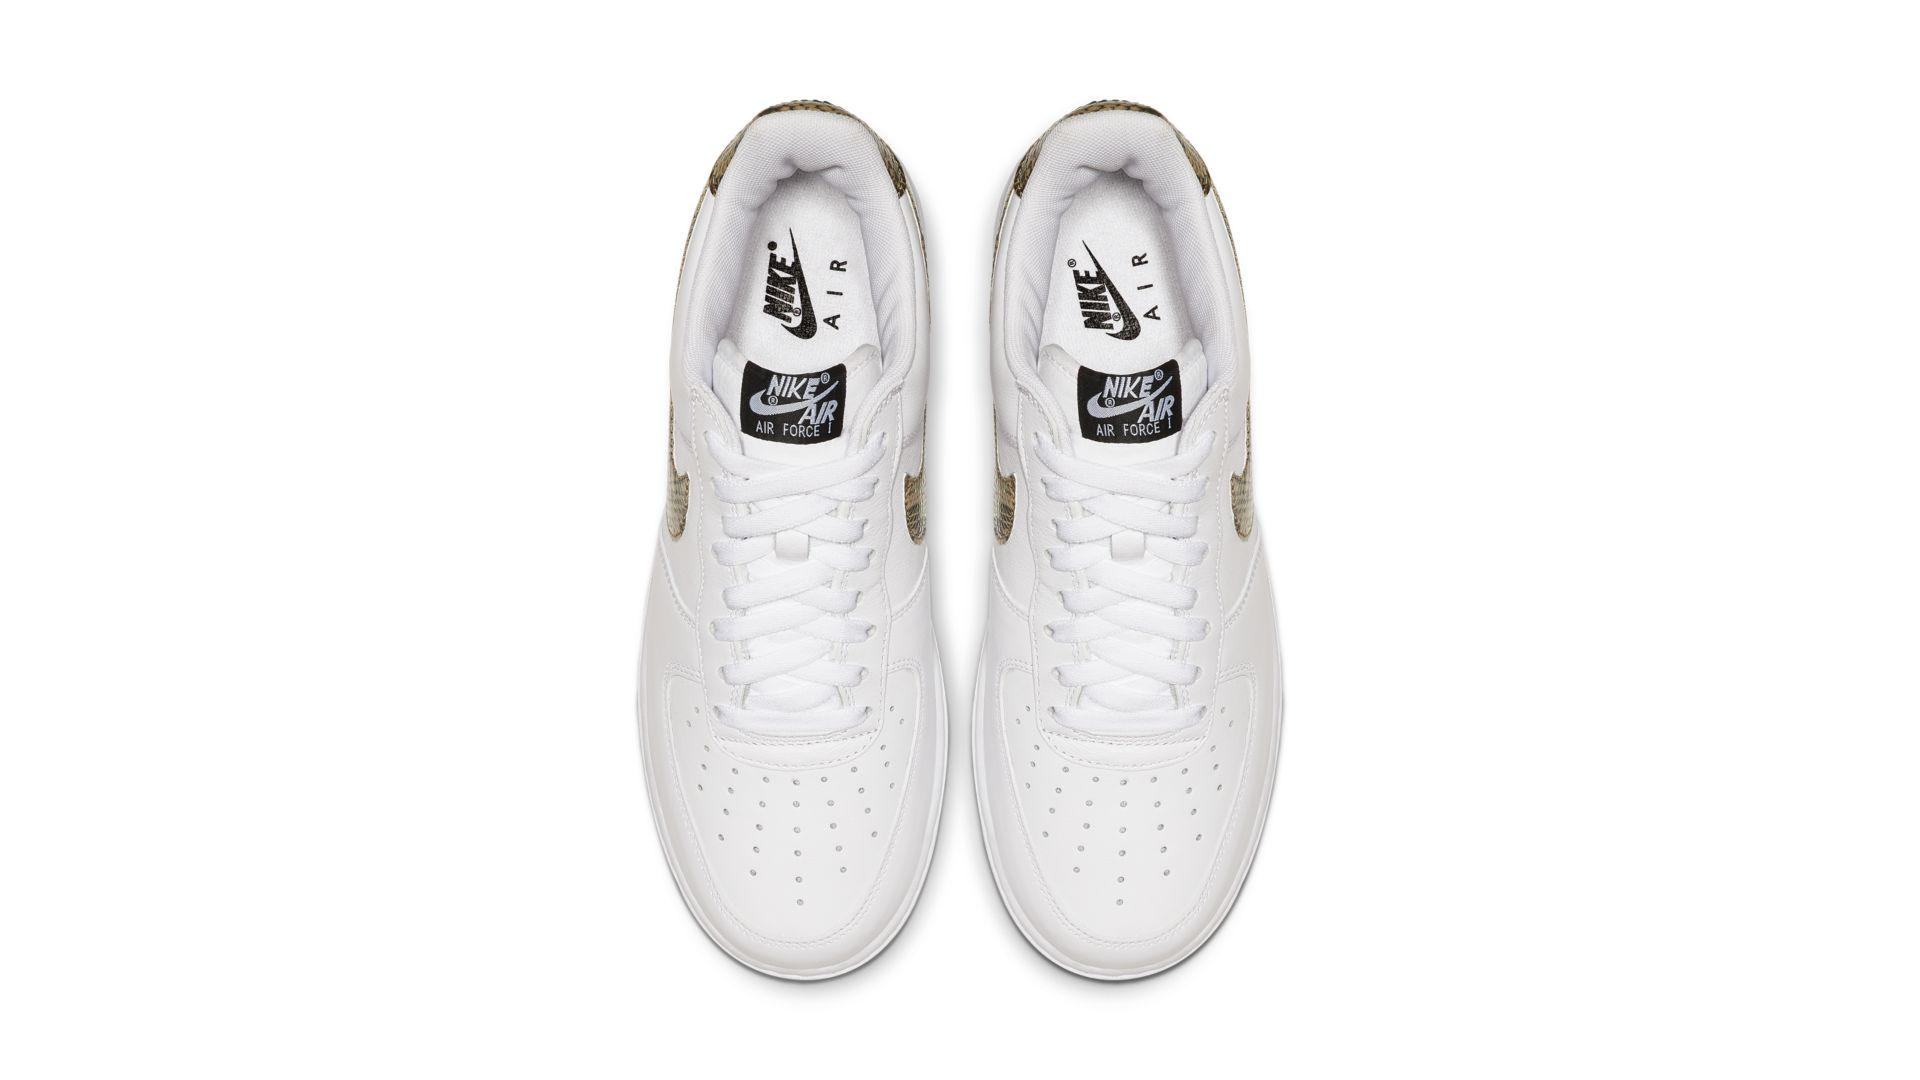 Nike Air Force 1 Low Premium QS 'Snake' (AO1635-100)